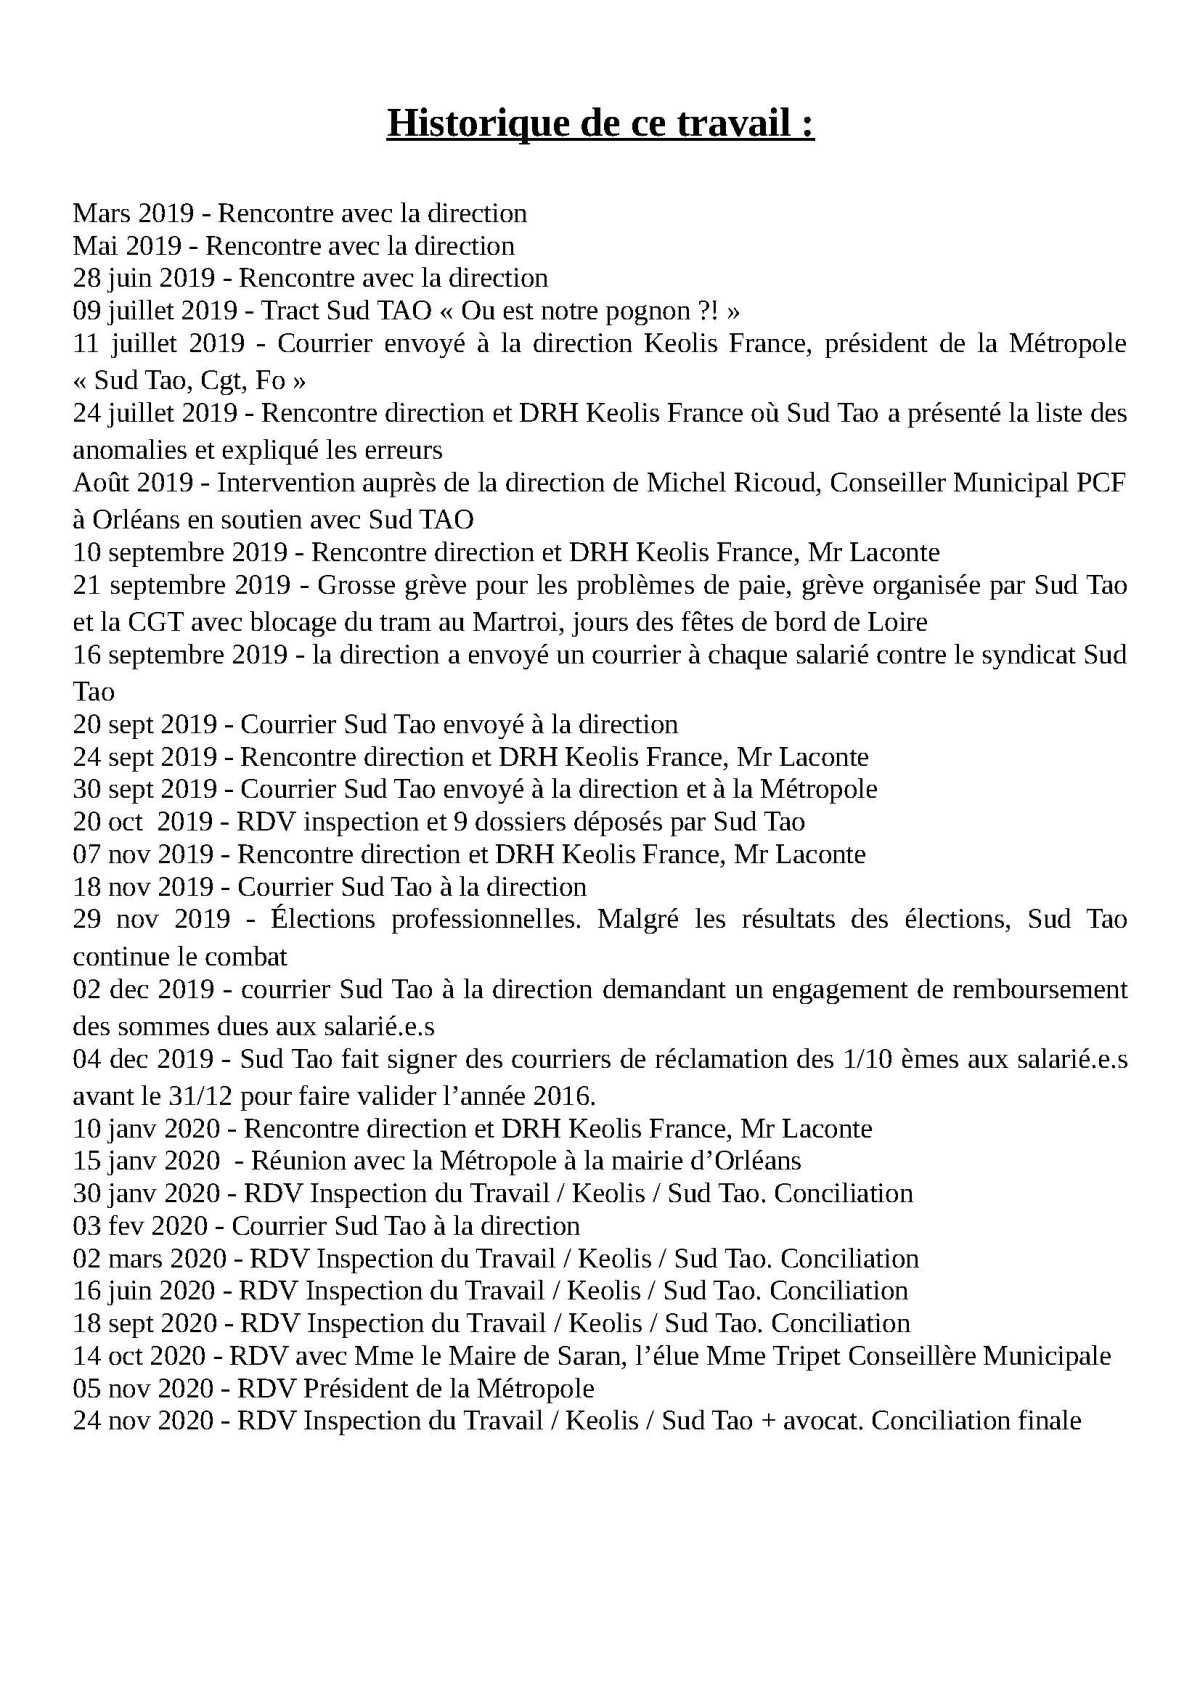 SUD TAO tract de régularisations démenti CFDT